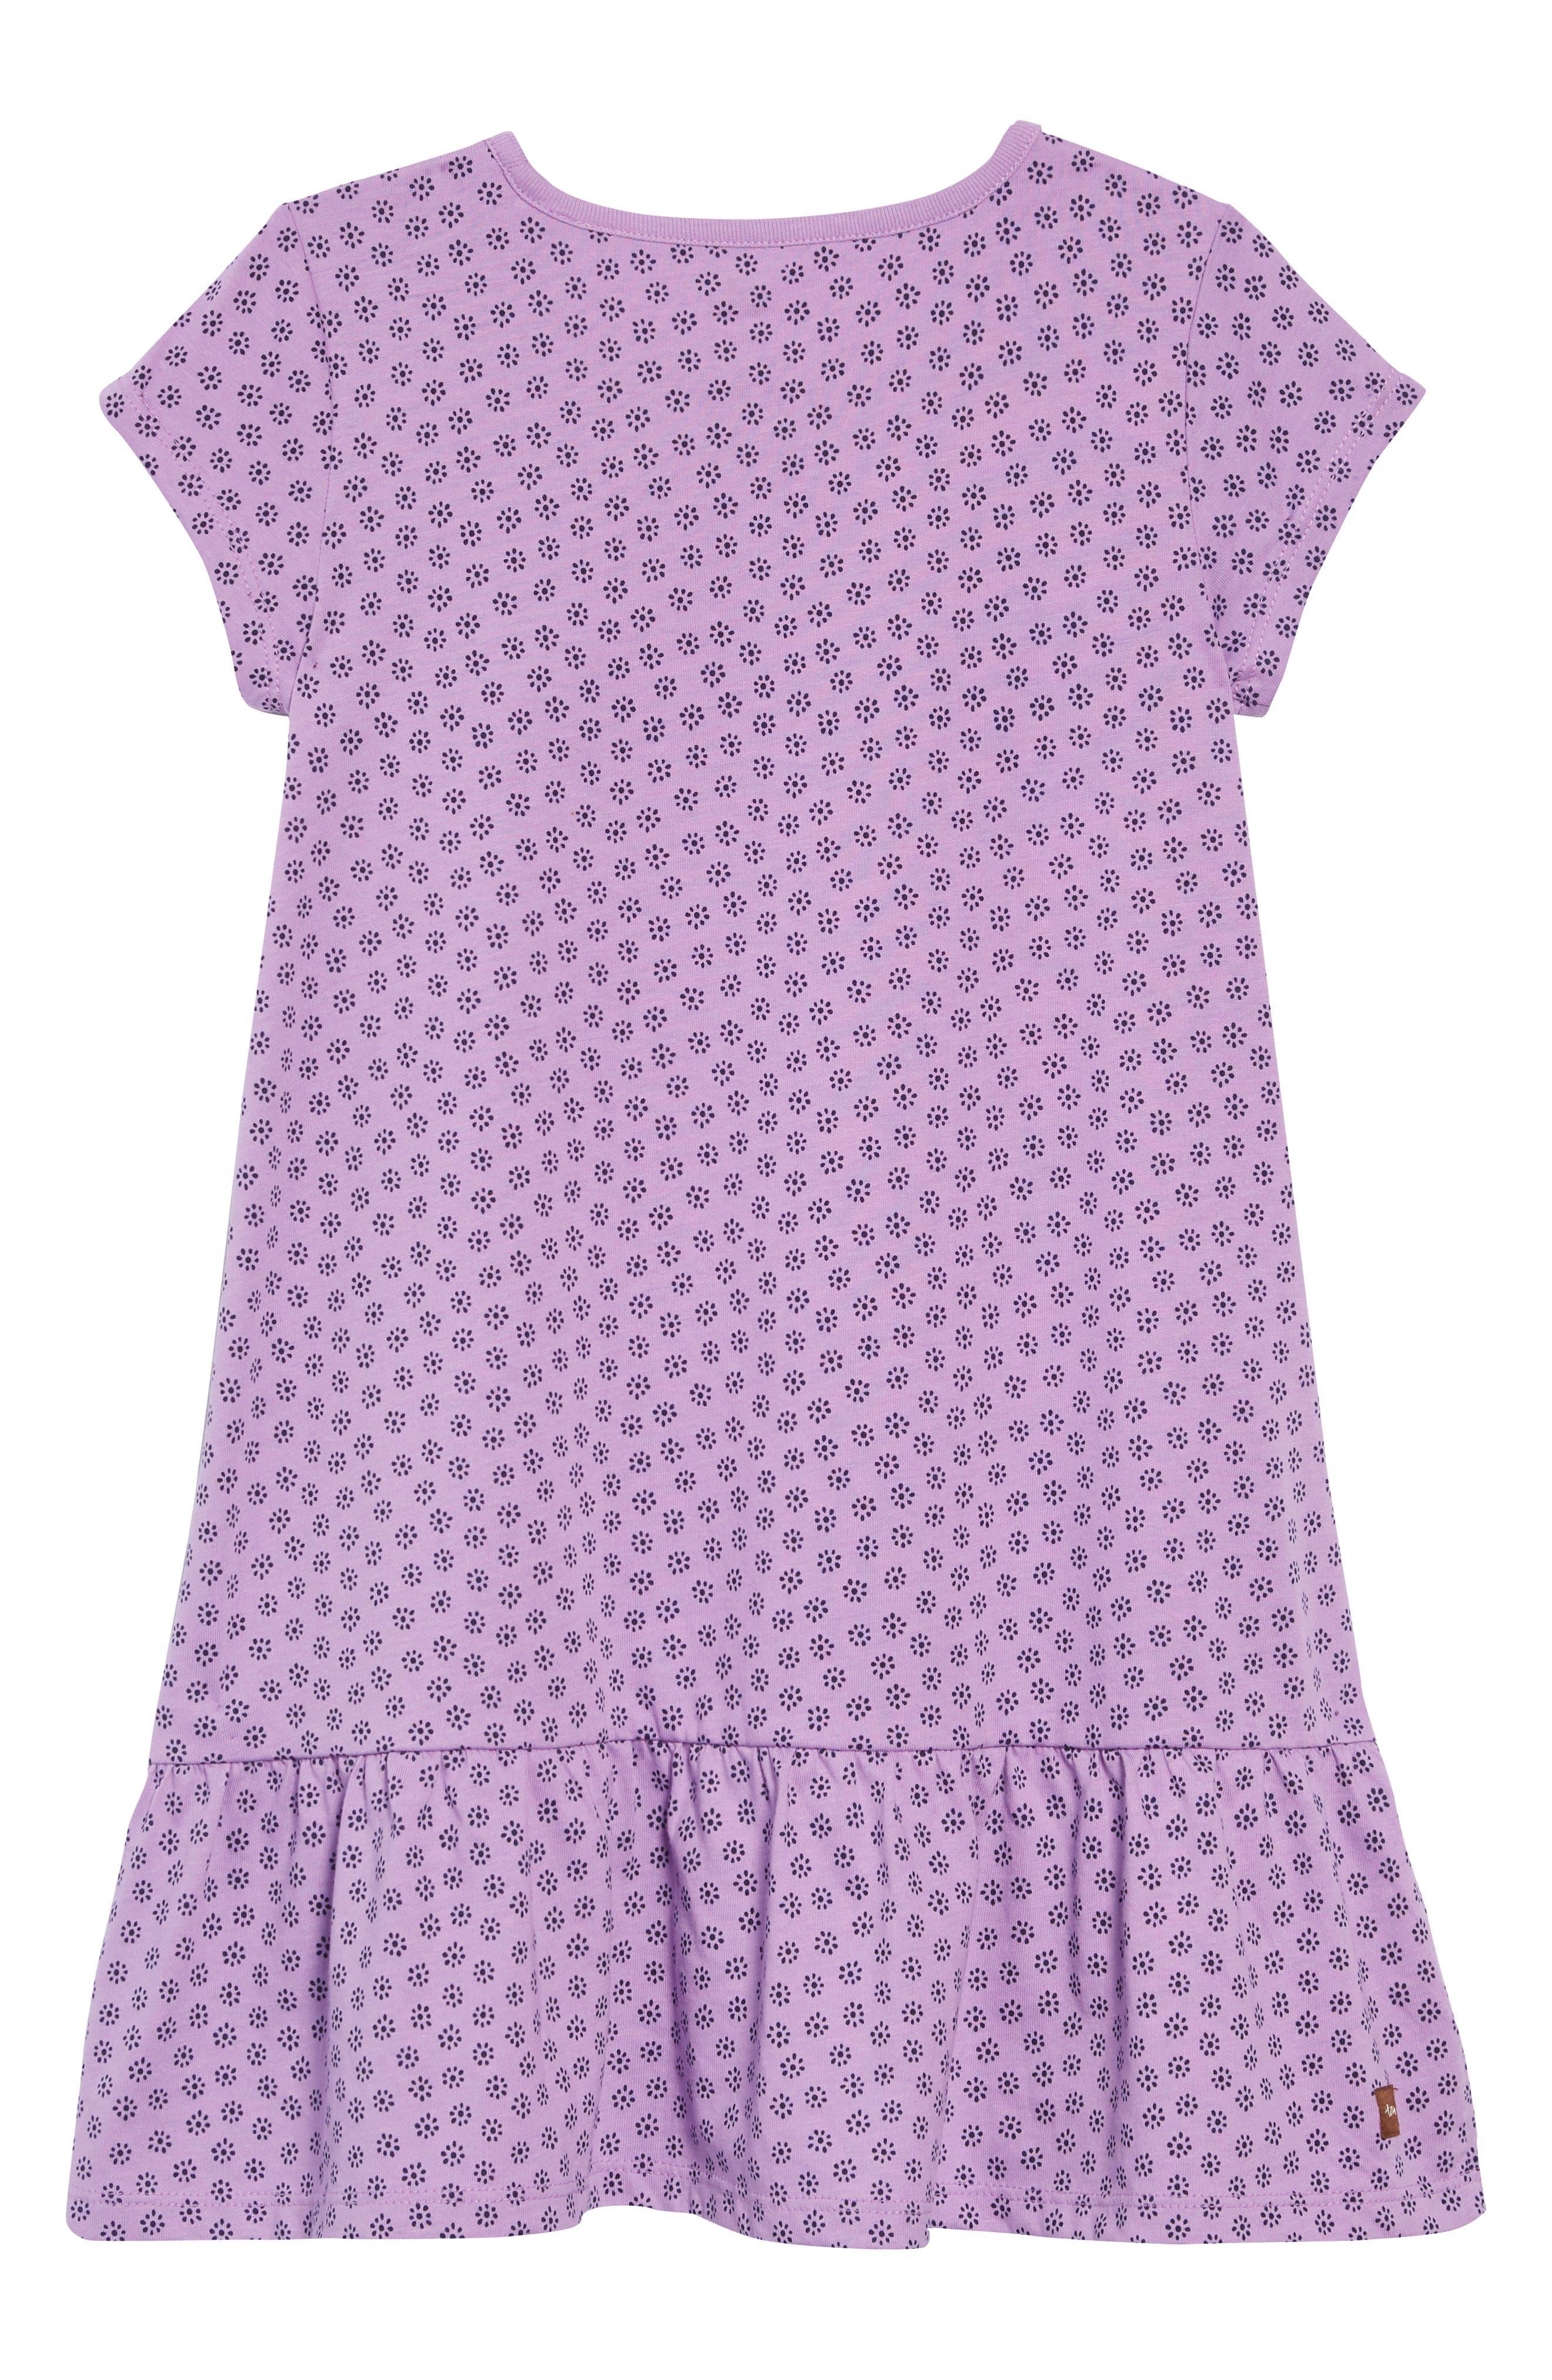 Print Ruffle Dress,                             Alternate thumbnail 2, color,                             POTTERY FLORAL